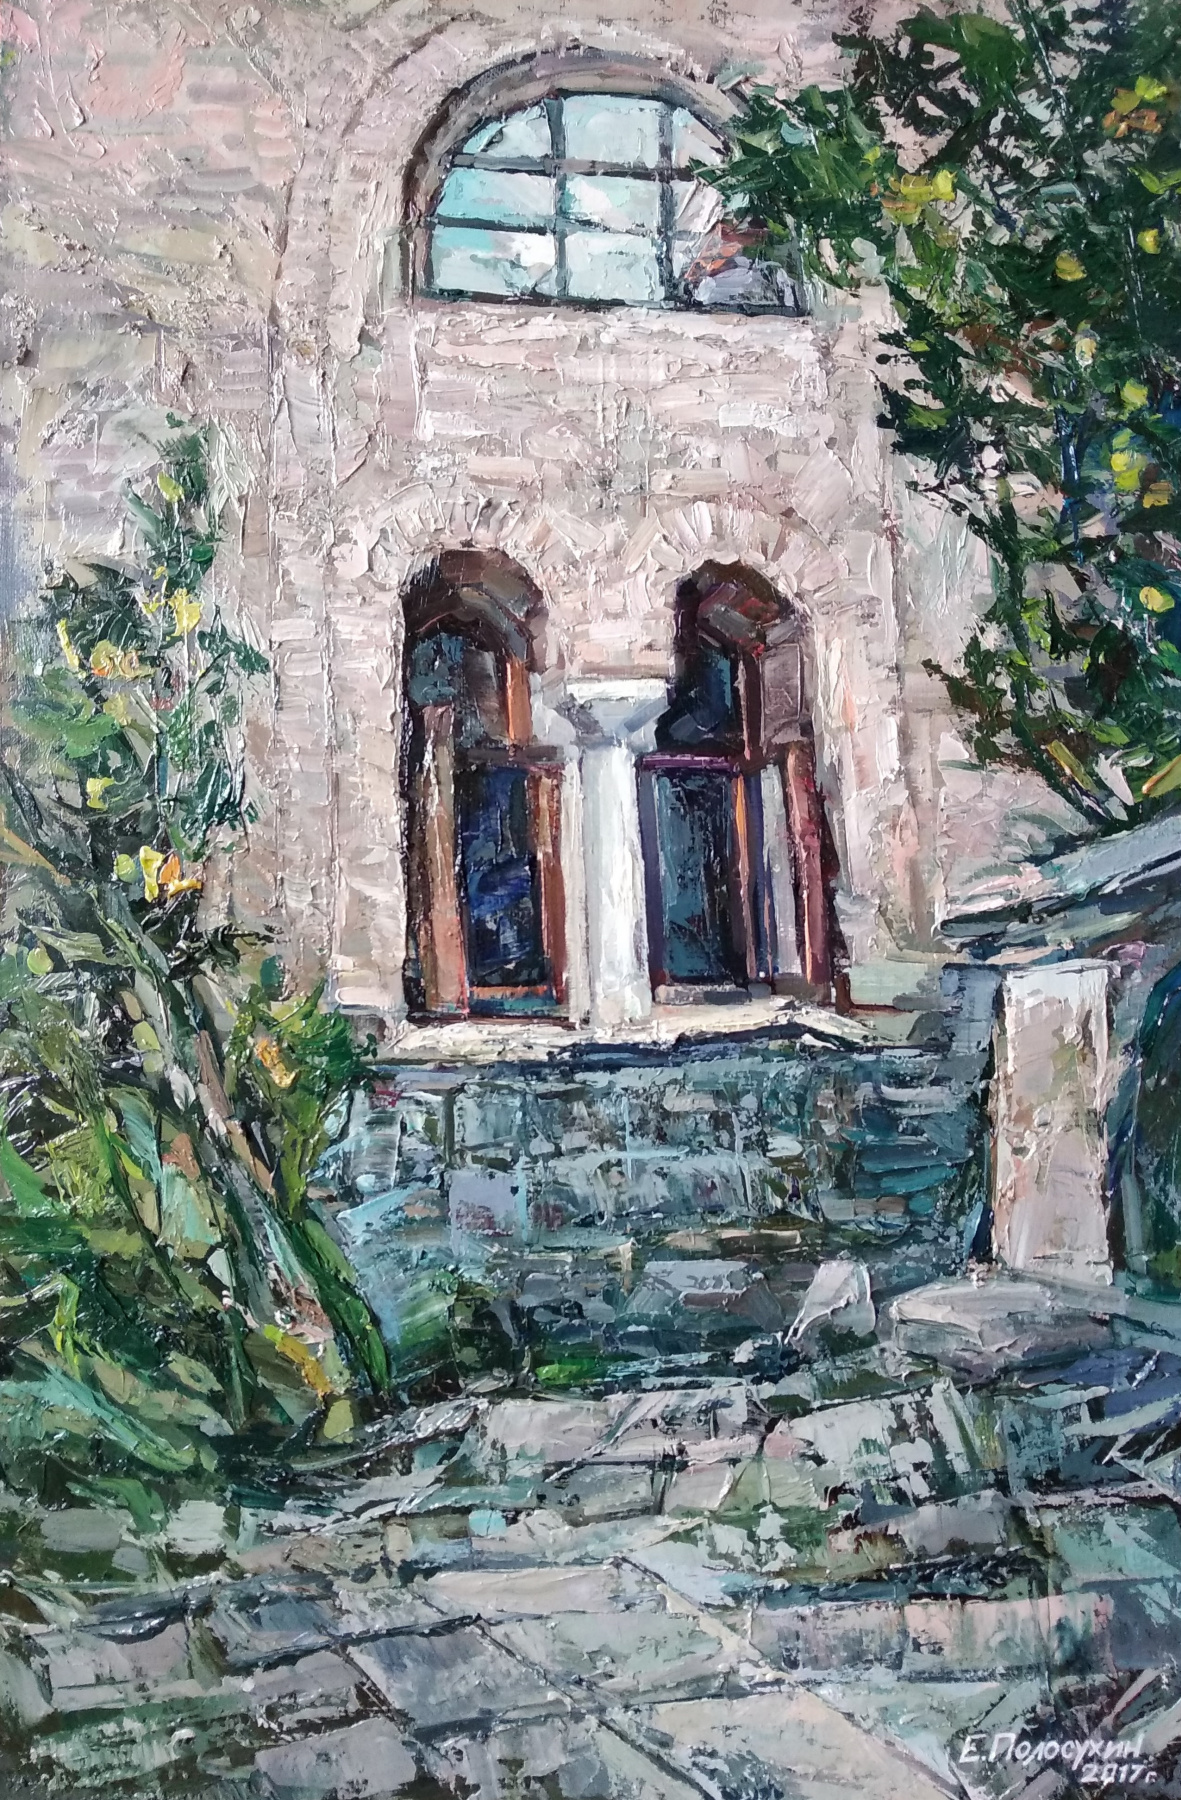 Evgeny Fedorovich Polosukhin. Athos. In the courtyard of the Dochiar monastery.